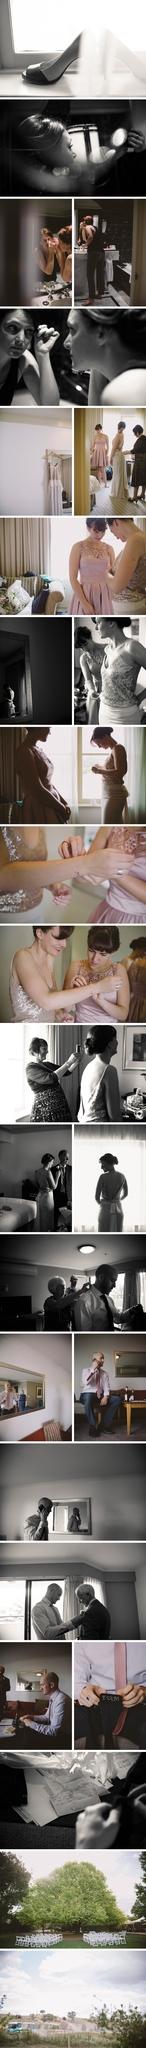 Poachers Pantry Wedding Photos